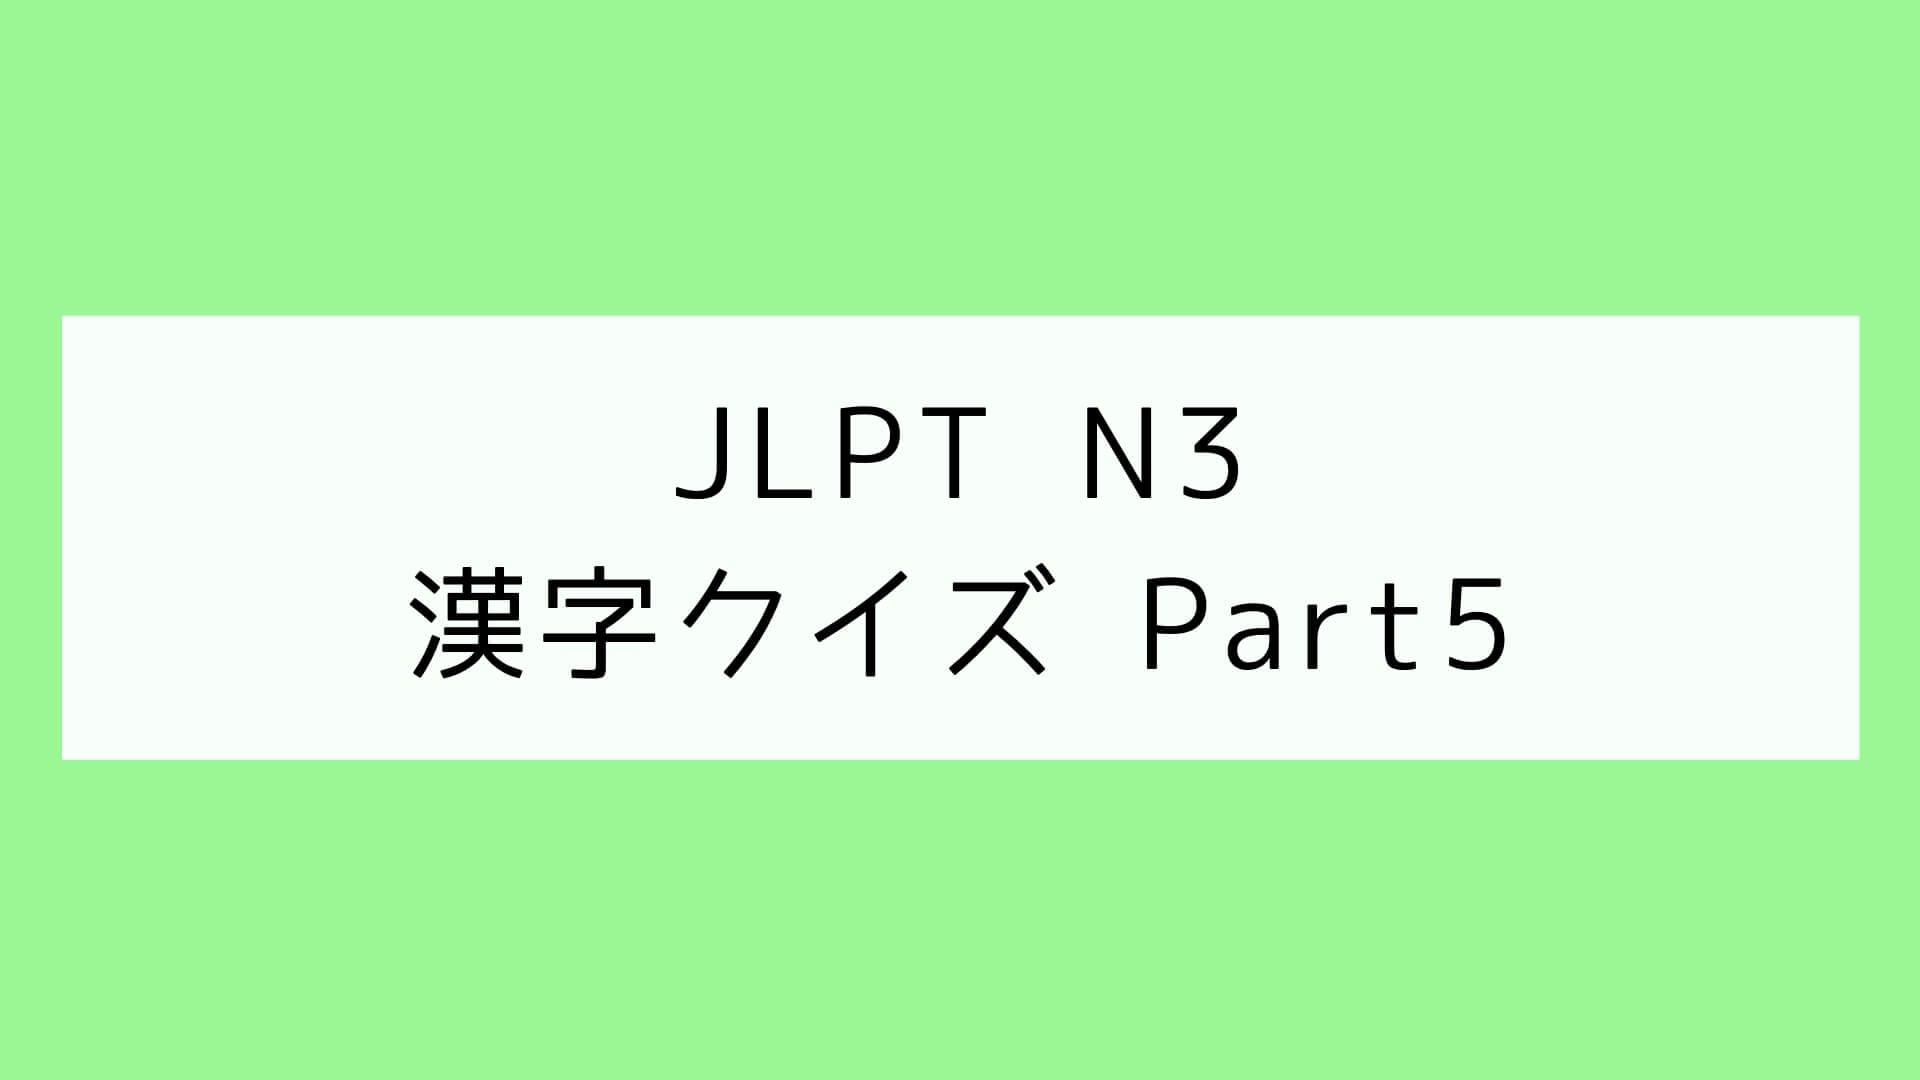 【JLPT N3】漢字クイズ Part5